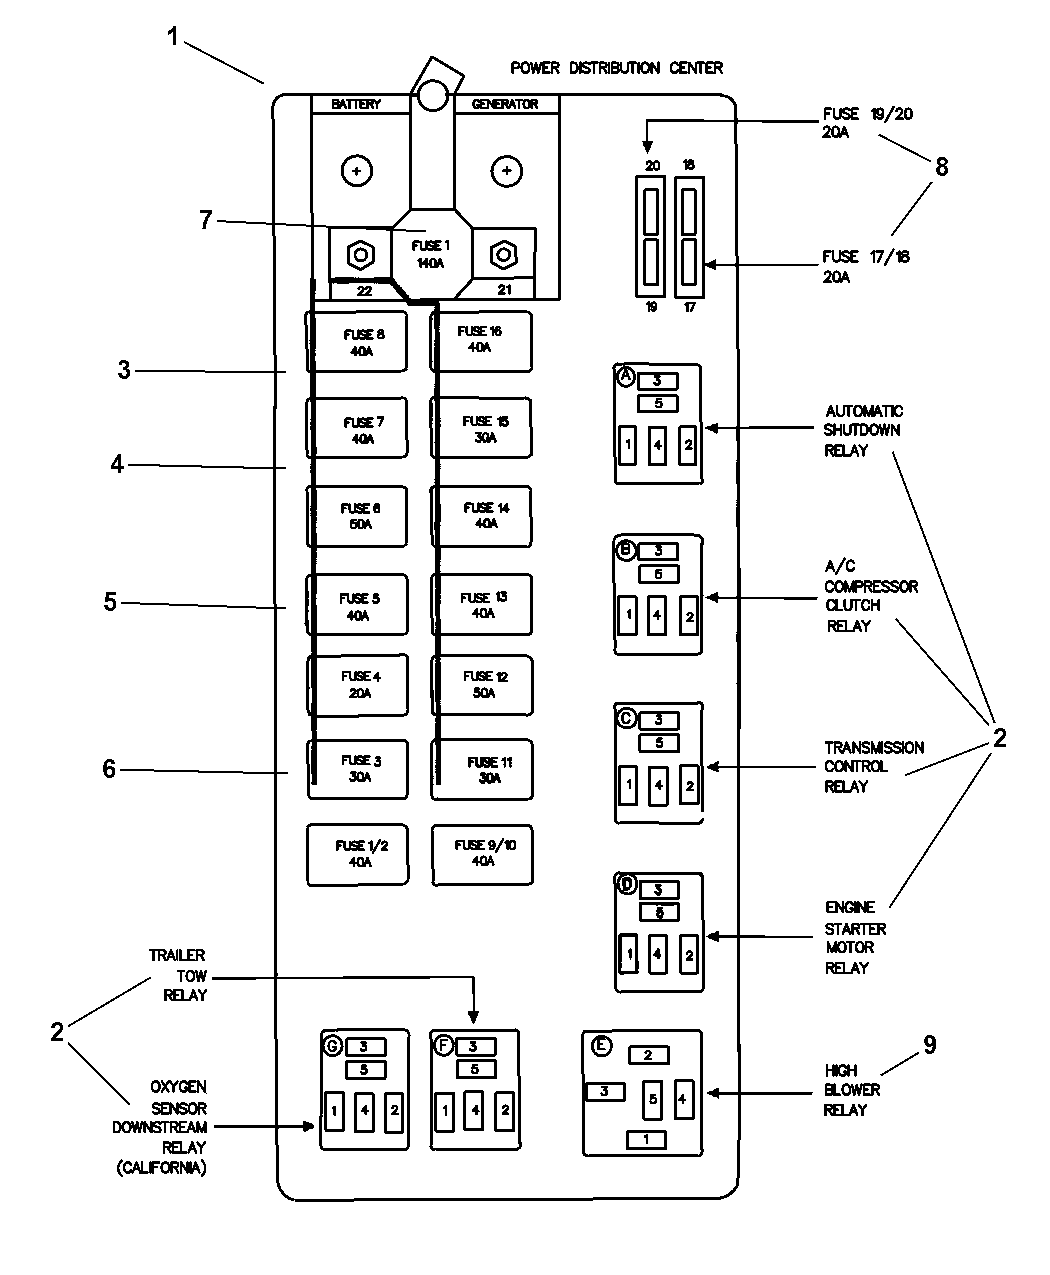 2001 Dodge Ram Van Power Distribution Center Relay & Fuses